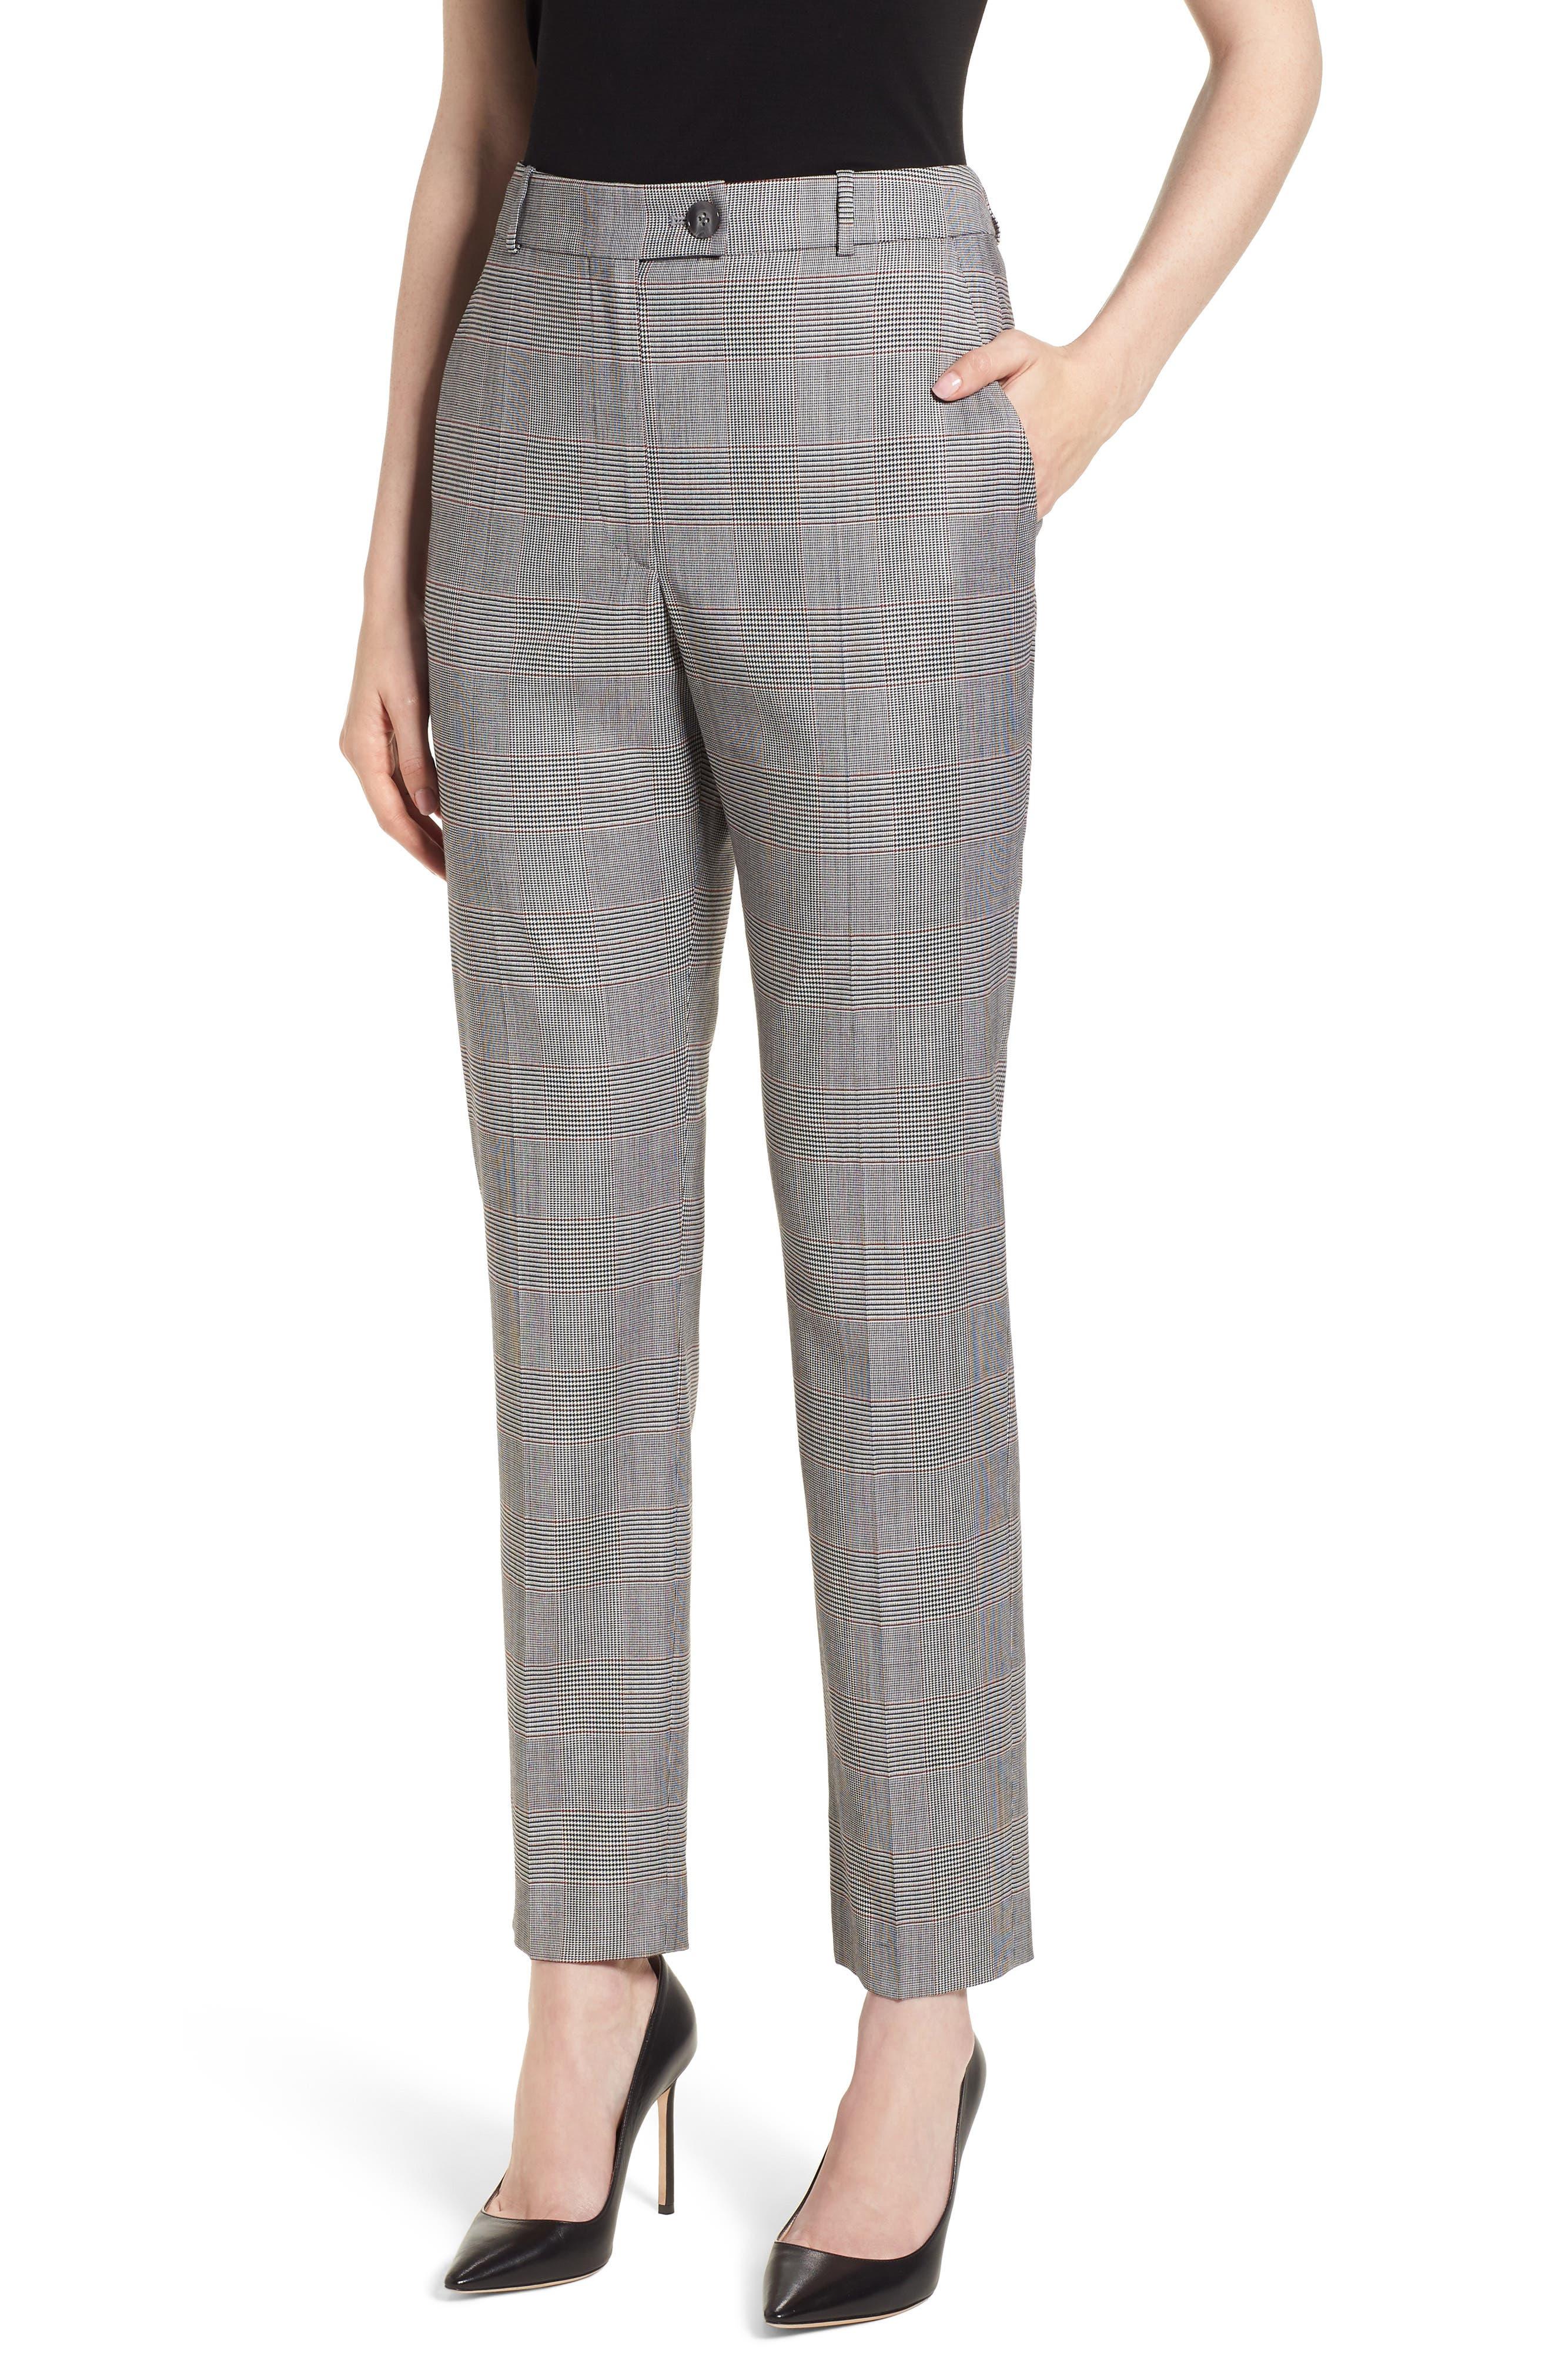 Tofilia Glencheck Slim Fit Trousers,                         Main,                         color, Dark Sunset Orange Fantasy